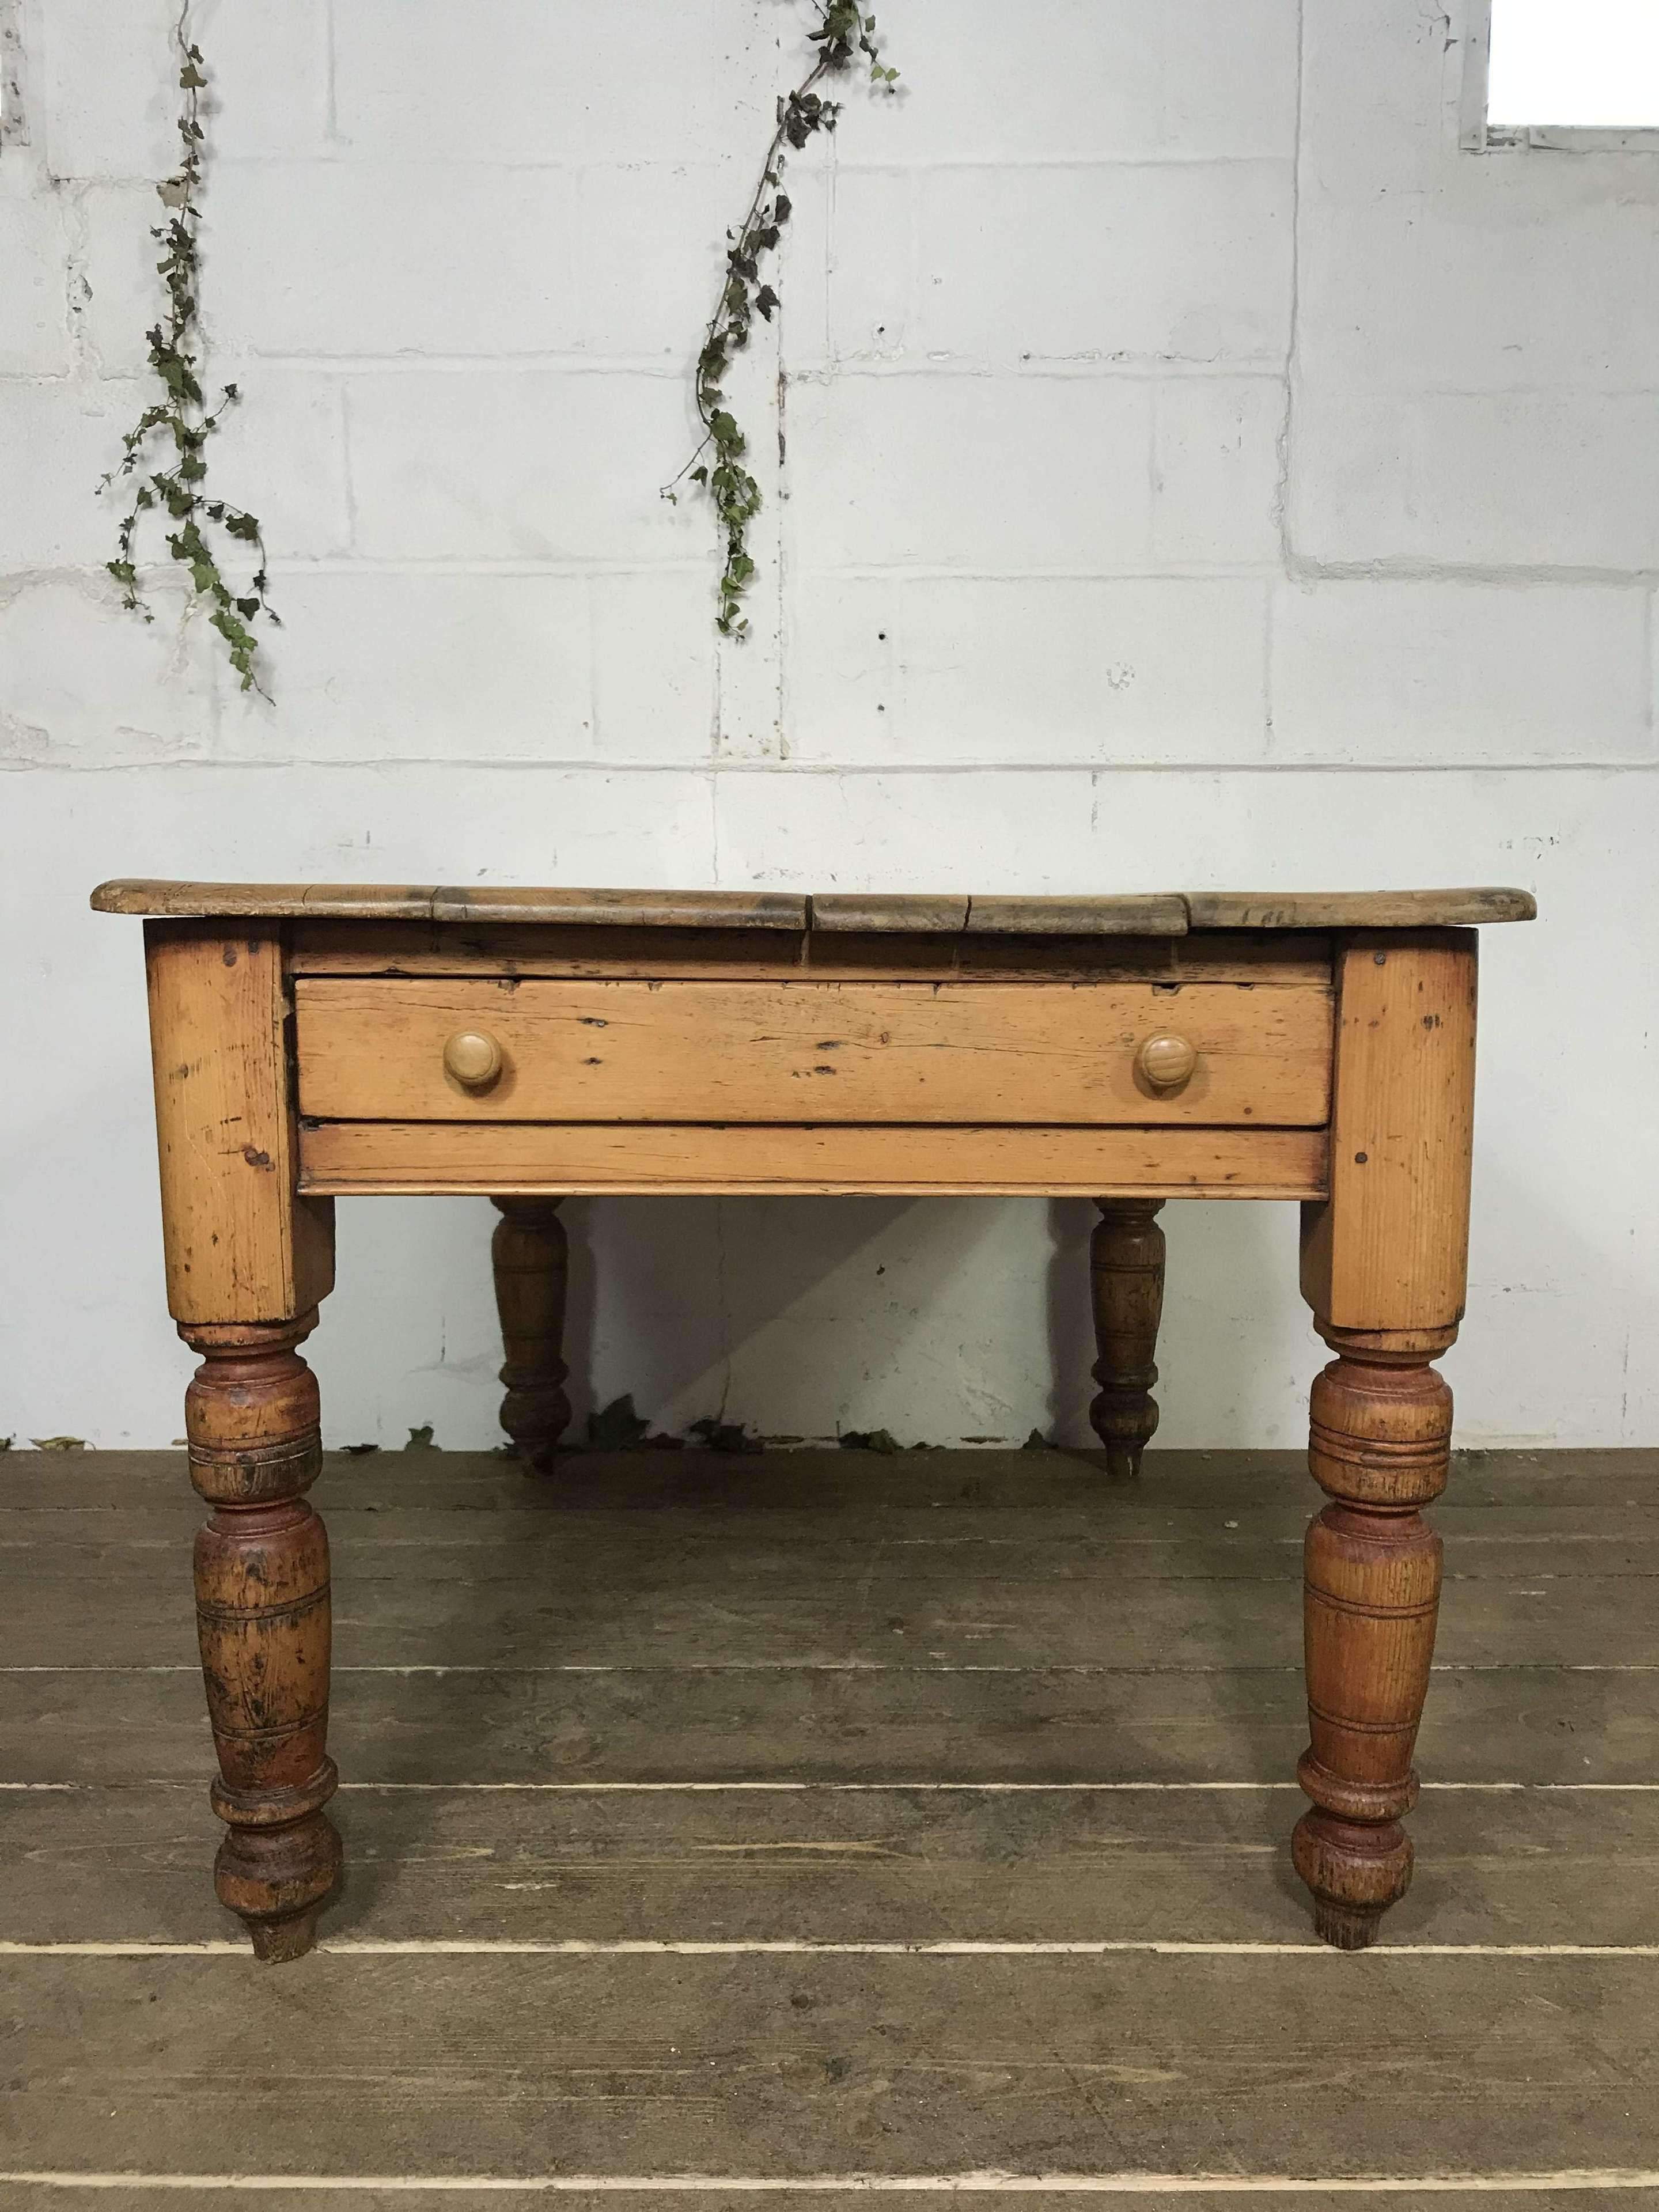 Pine farmhouse table c.1900